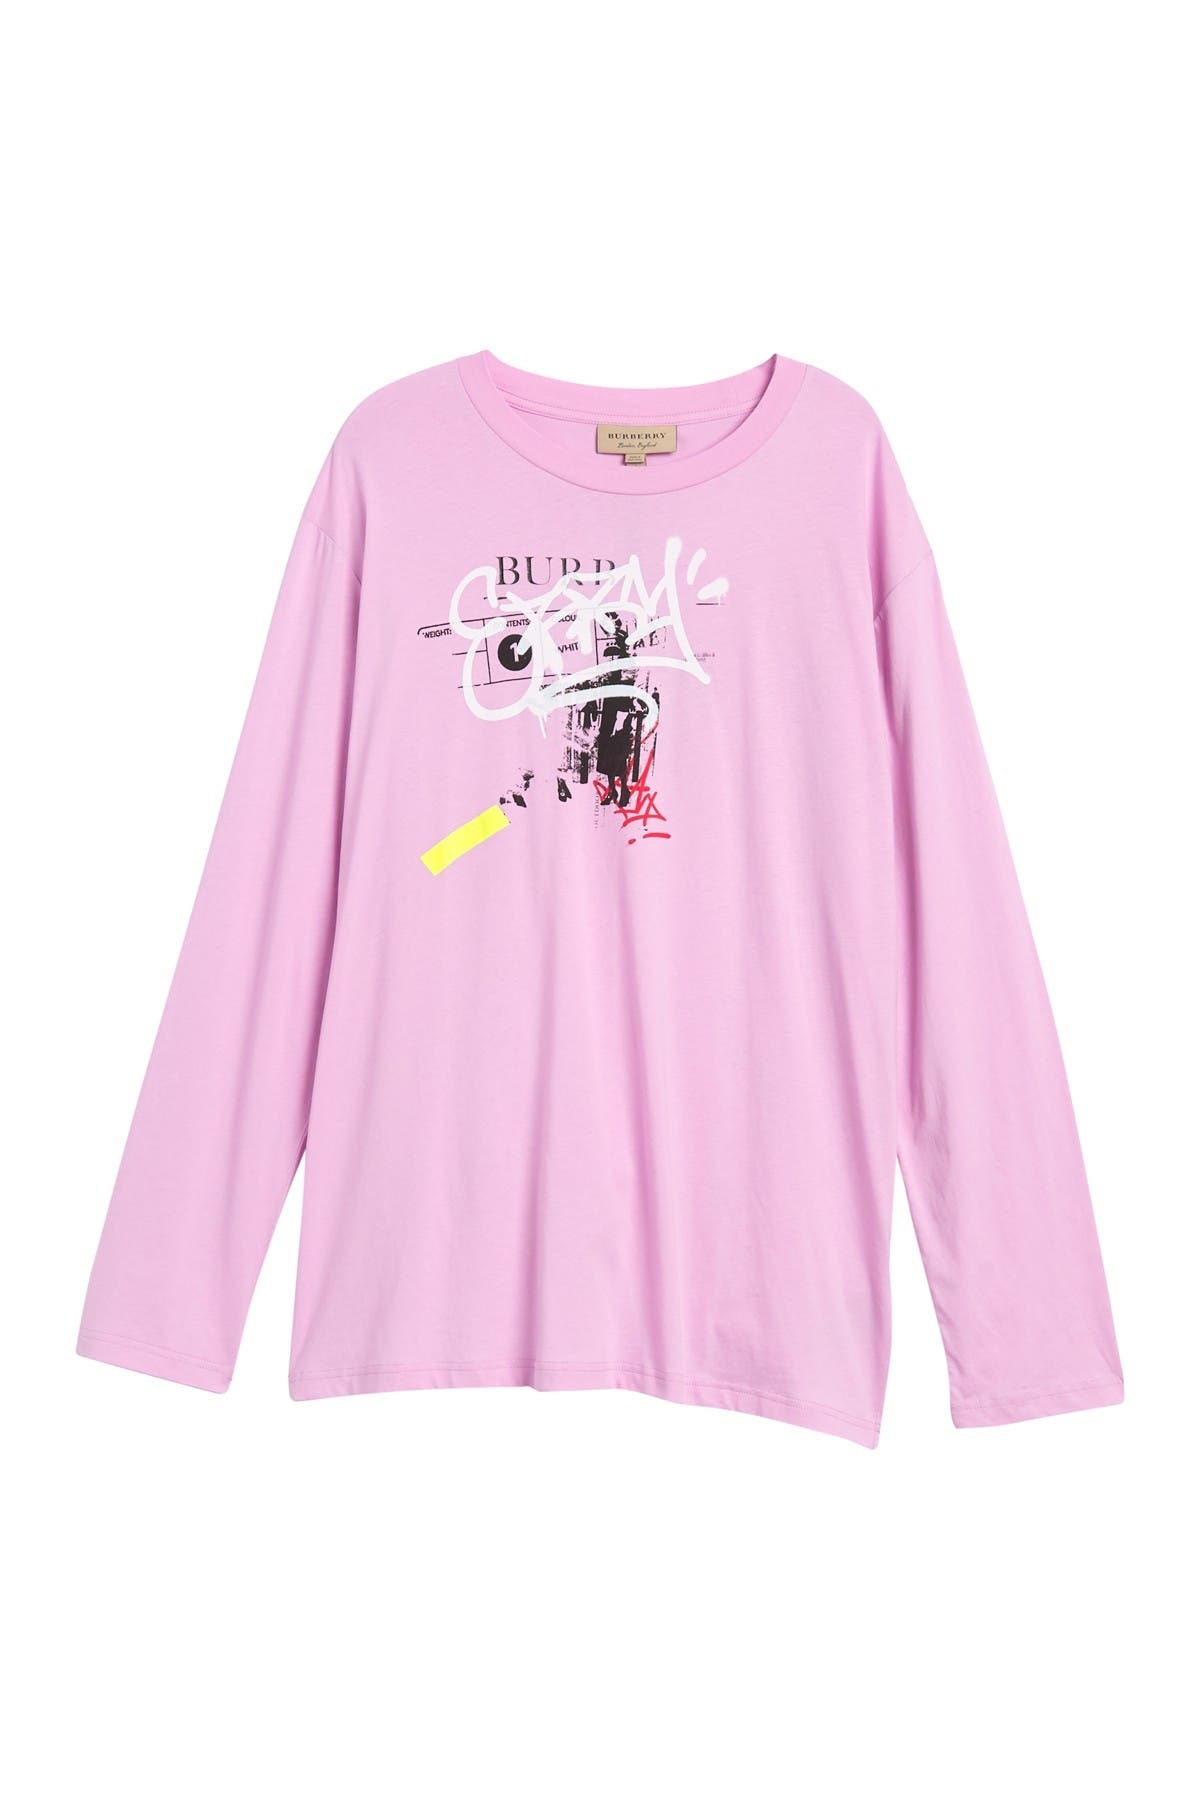 Burberry Cordan Graffitied Print Cotton T-shirt In Pink